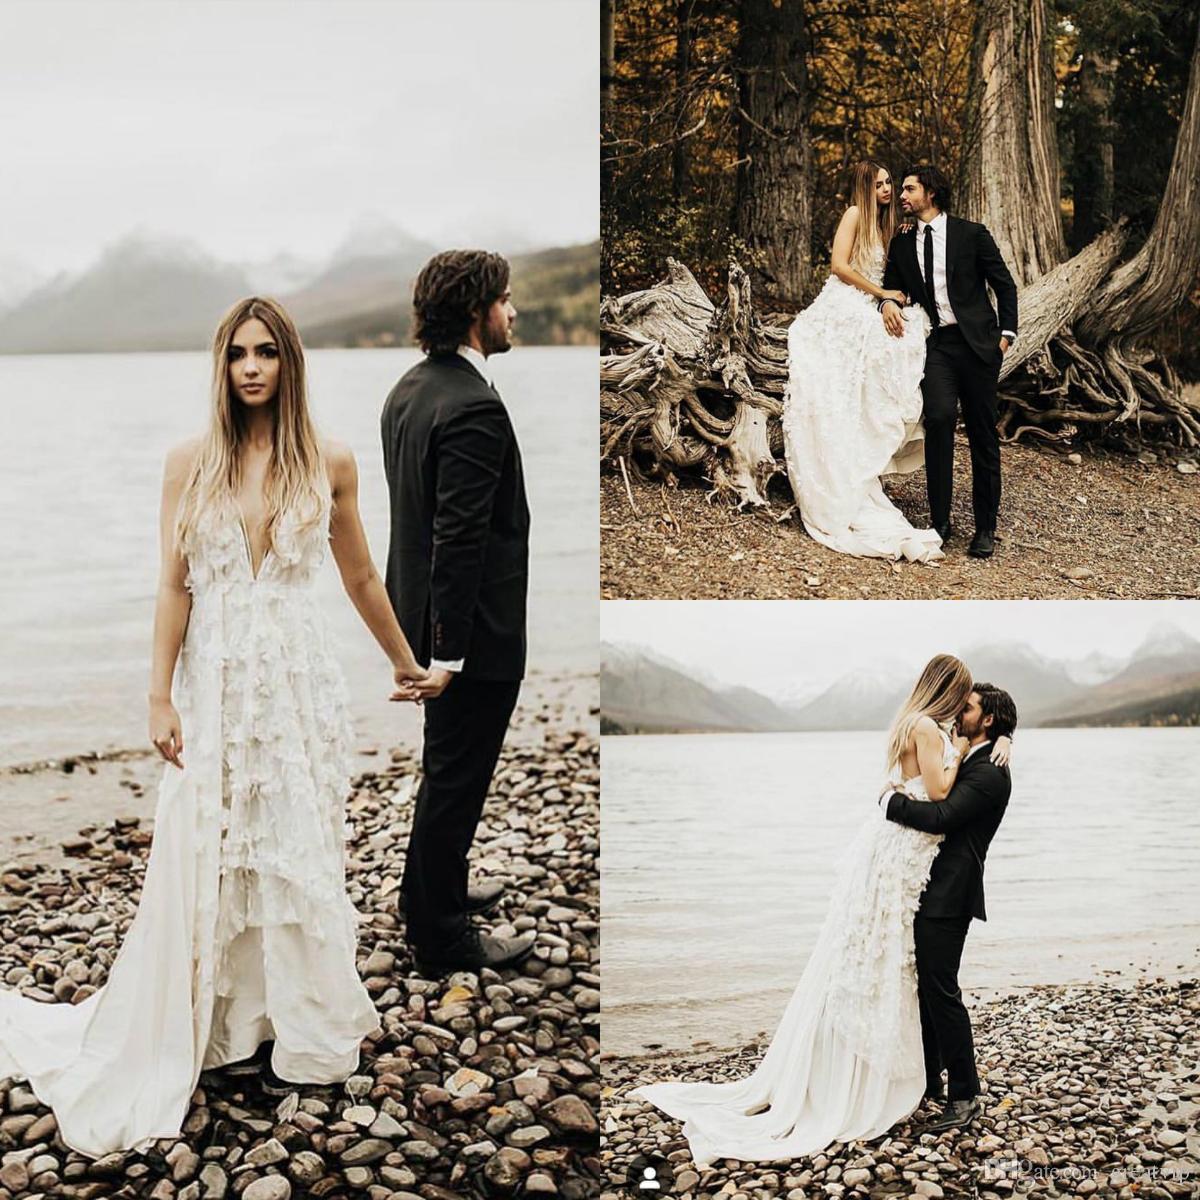 Bohemia Beach Wedding Dresses A Line Spaghetti 3D Floral Appliques Backless  Chiffon Bridal Gowns Plus Size Boho Wedding Dress robe de mariée